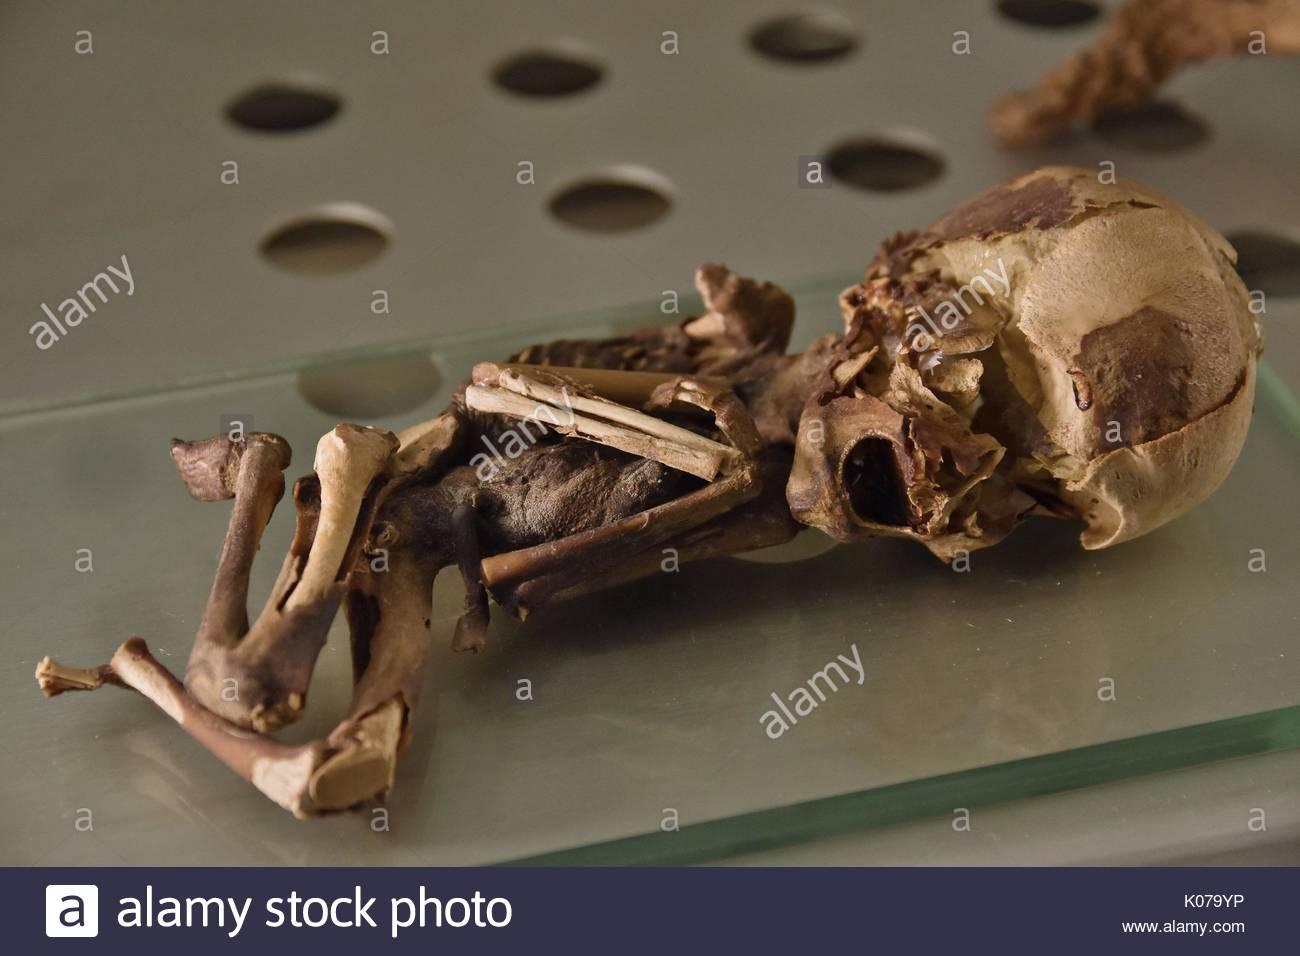 Mummy of 5-6 months old fetus displayed at Museum of Nature and Man (Museo de la Naturaleza y el Hombre) Santa Cruz de Tenerife Canary Islands - Stock Image